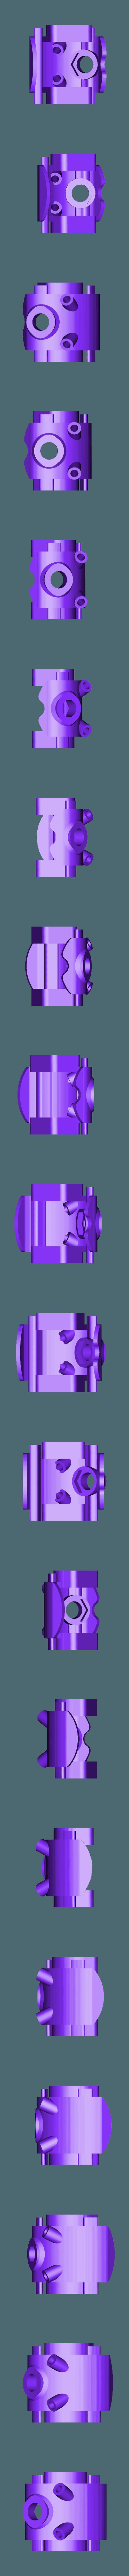 GepRC_CX2_Antenna_Mount.stl Download free STL file GEPRC CX2/CX3 (Cinepro 4K, Cineking, CineQueen) - Various Antenna Mounts and VTX • 3D printer design, rodrigosclosa